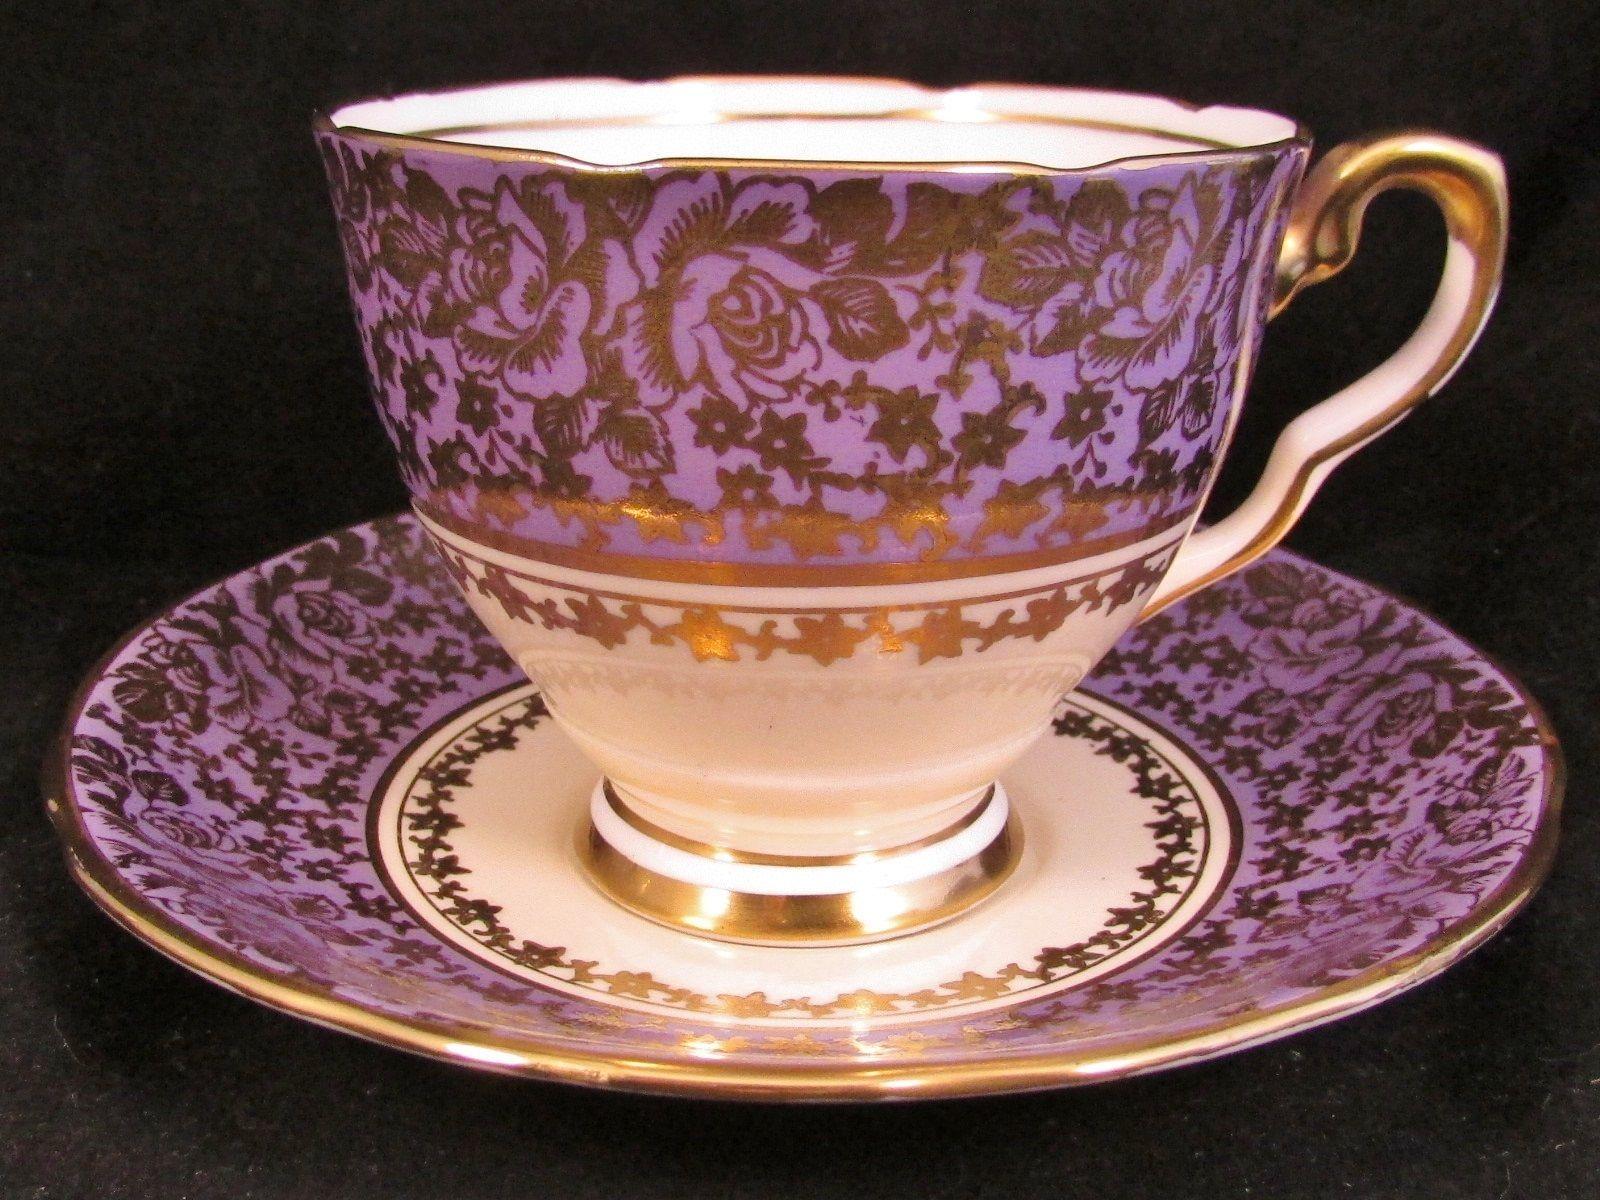 Royal albert bone china tea cup amp saucer winsome pattern ebay - Royal Stafford Purple Gold Gilt Rose Chintz Tea Cup And Saucer Ebay